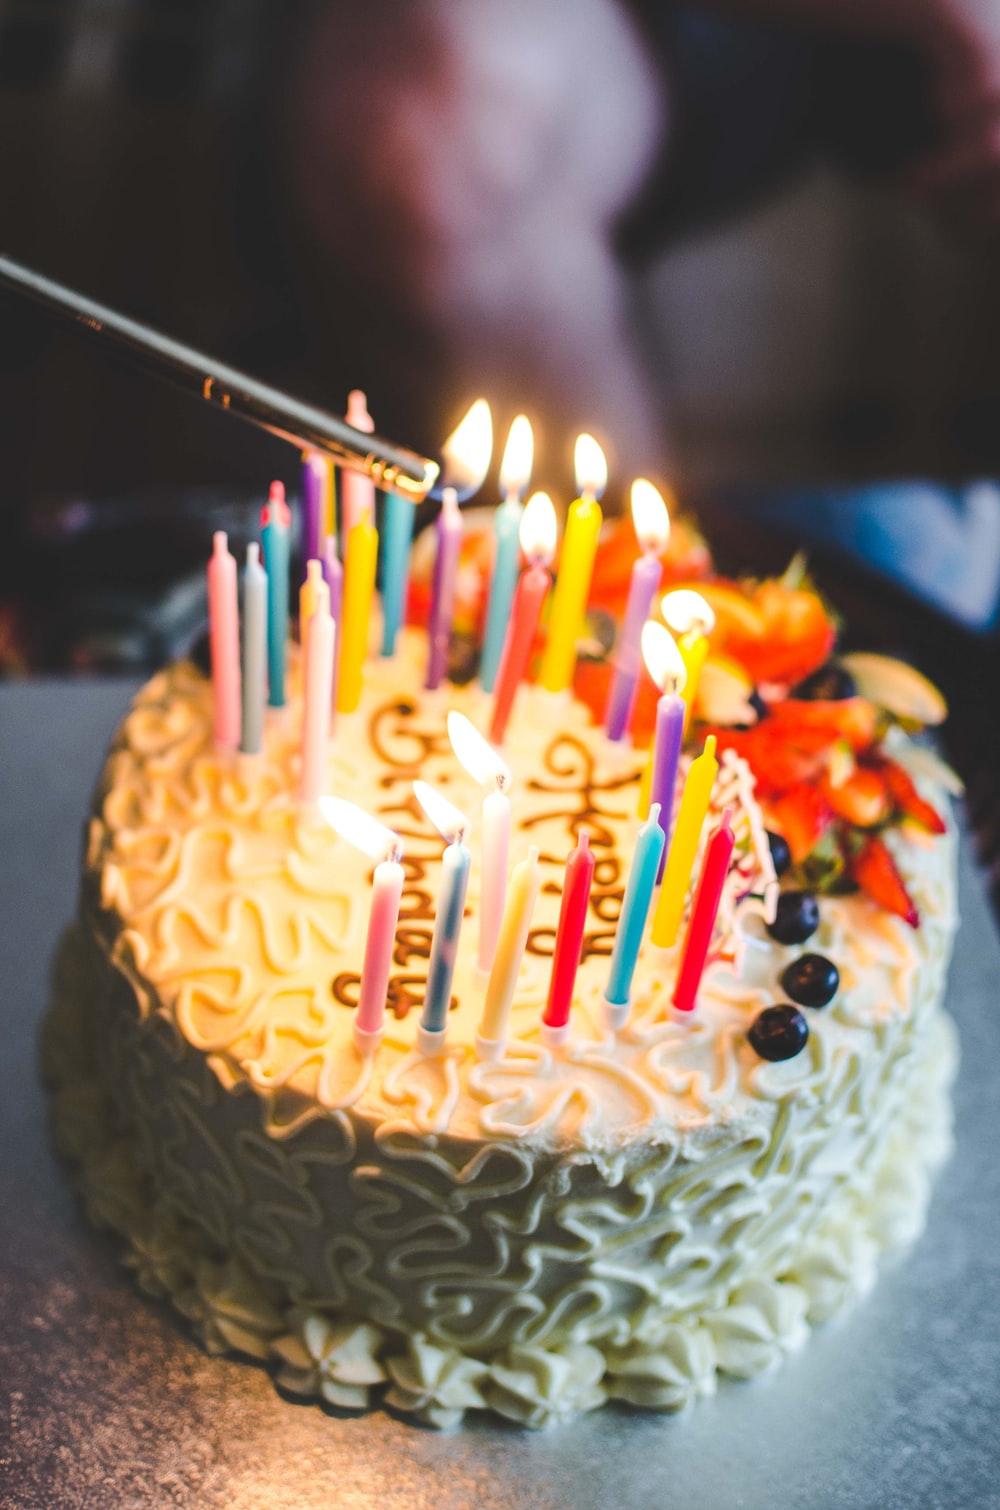 PunjabKesari, 02 August 2020, birthday predictions for today, Todays Birthday Prediction, Born Today Horoscope Forecast, Birthday special, Acharya Lokesh Dhamija, Birthday Today, Todays Birthday Forecast, Happy Birthday To You, Happy Birthday